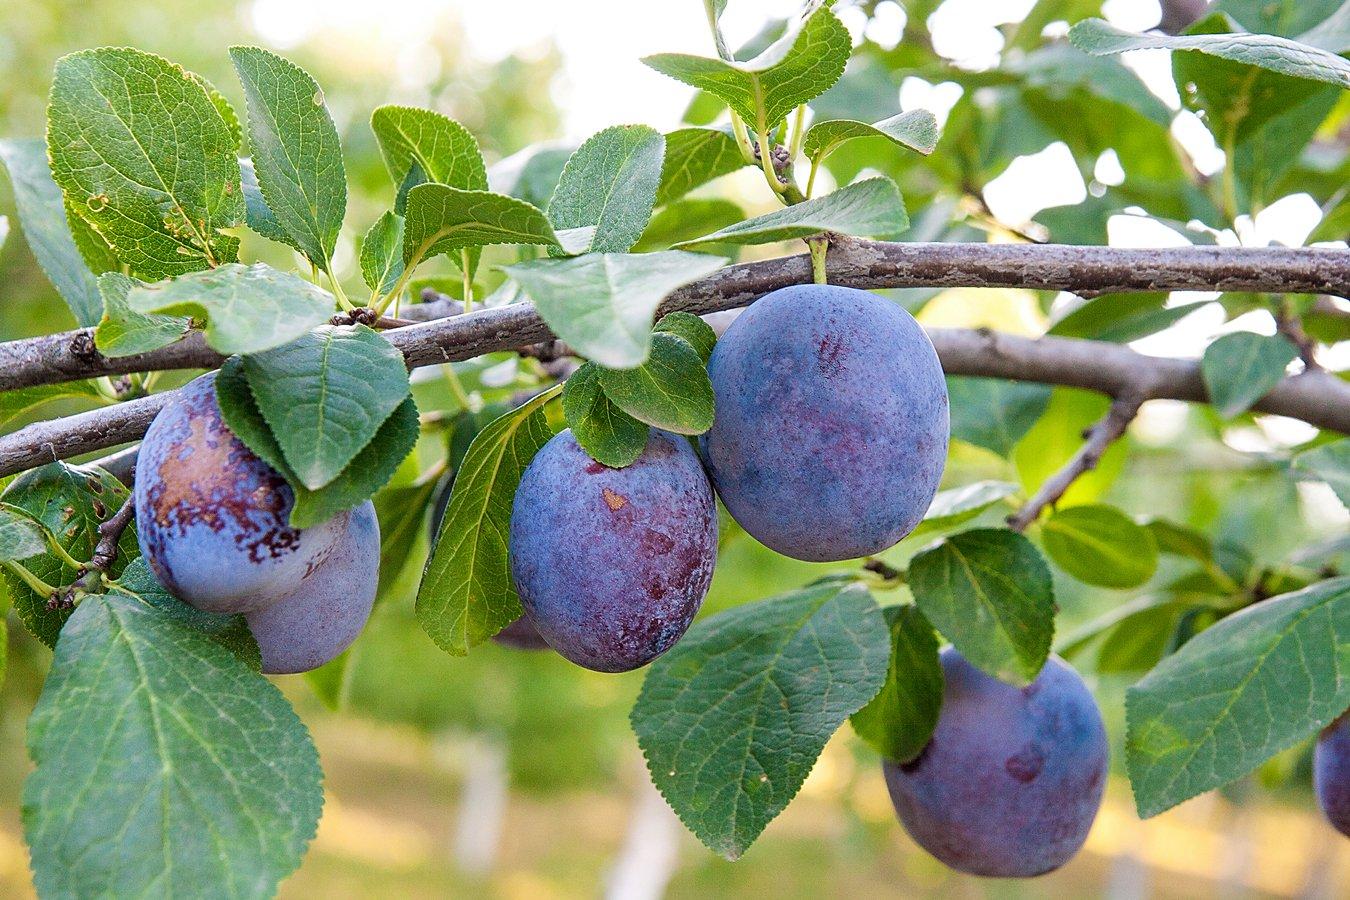 Organic Pitted Prunes, 1 Pound — Dried California Plums, Non-GMO, Kosher, Unsulfured, Unsweetened, Bulk